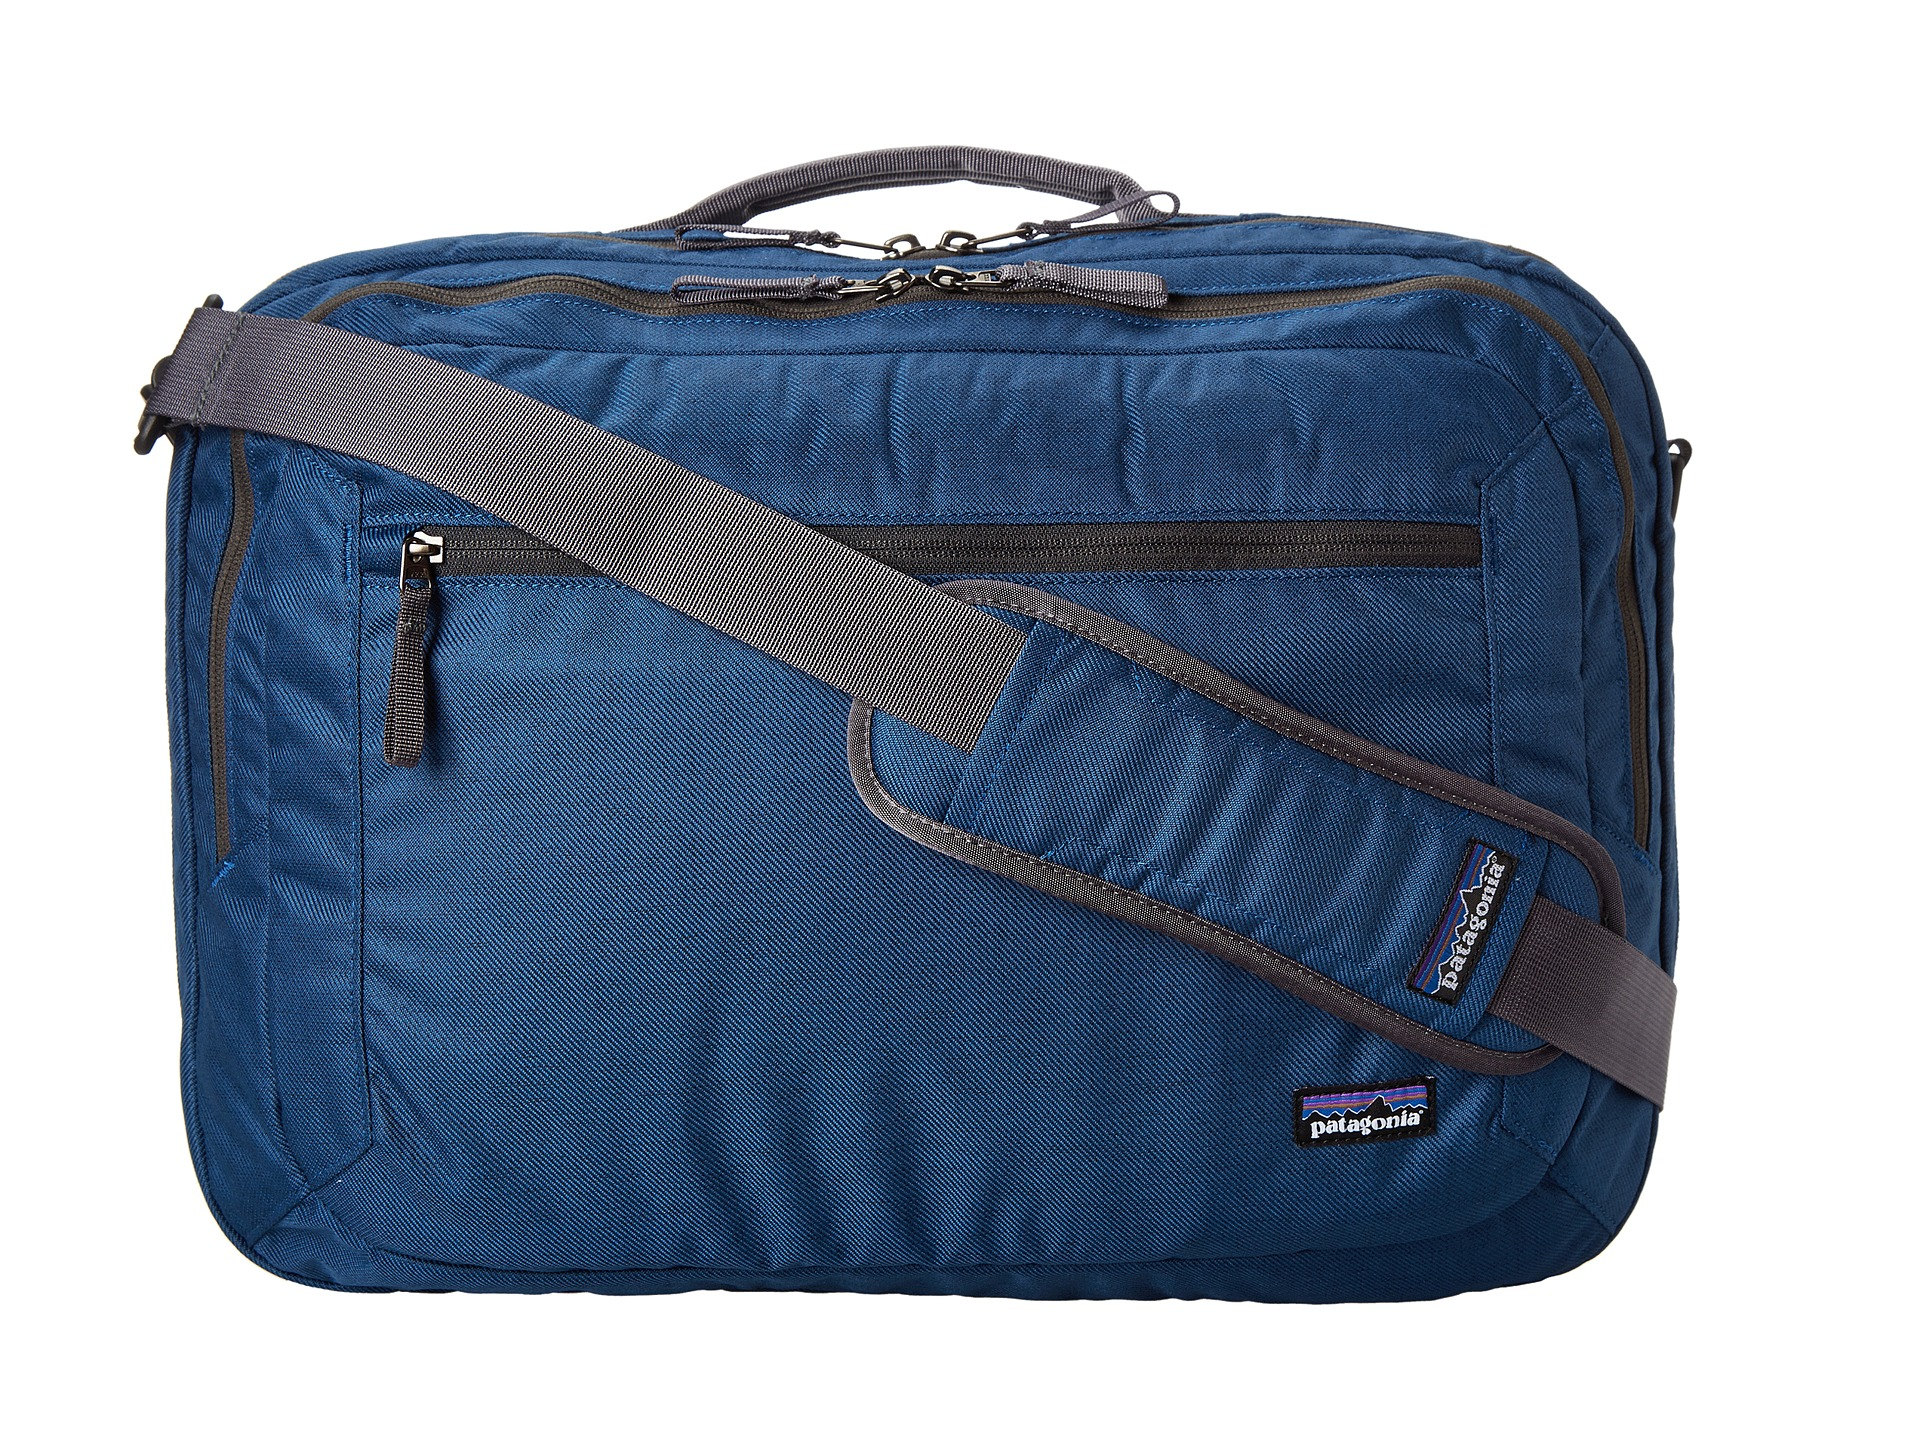 Patagonia Tote Bag Travel Youtube